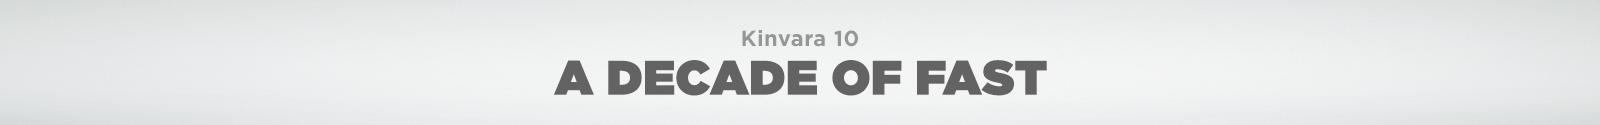 Kinvara 10. A decade of fast.